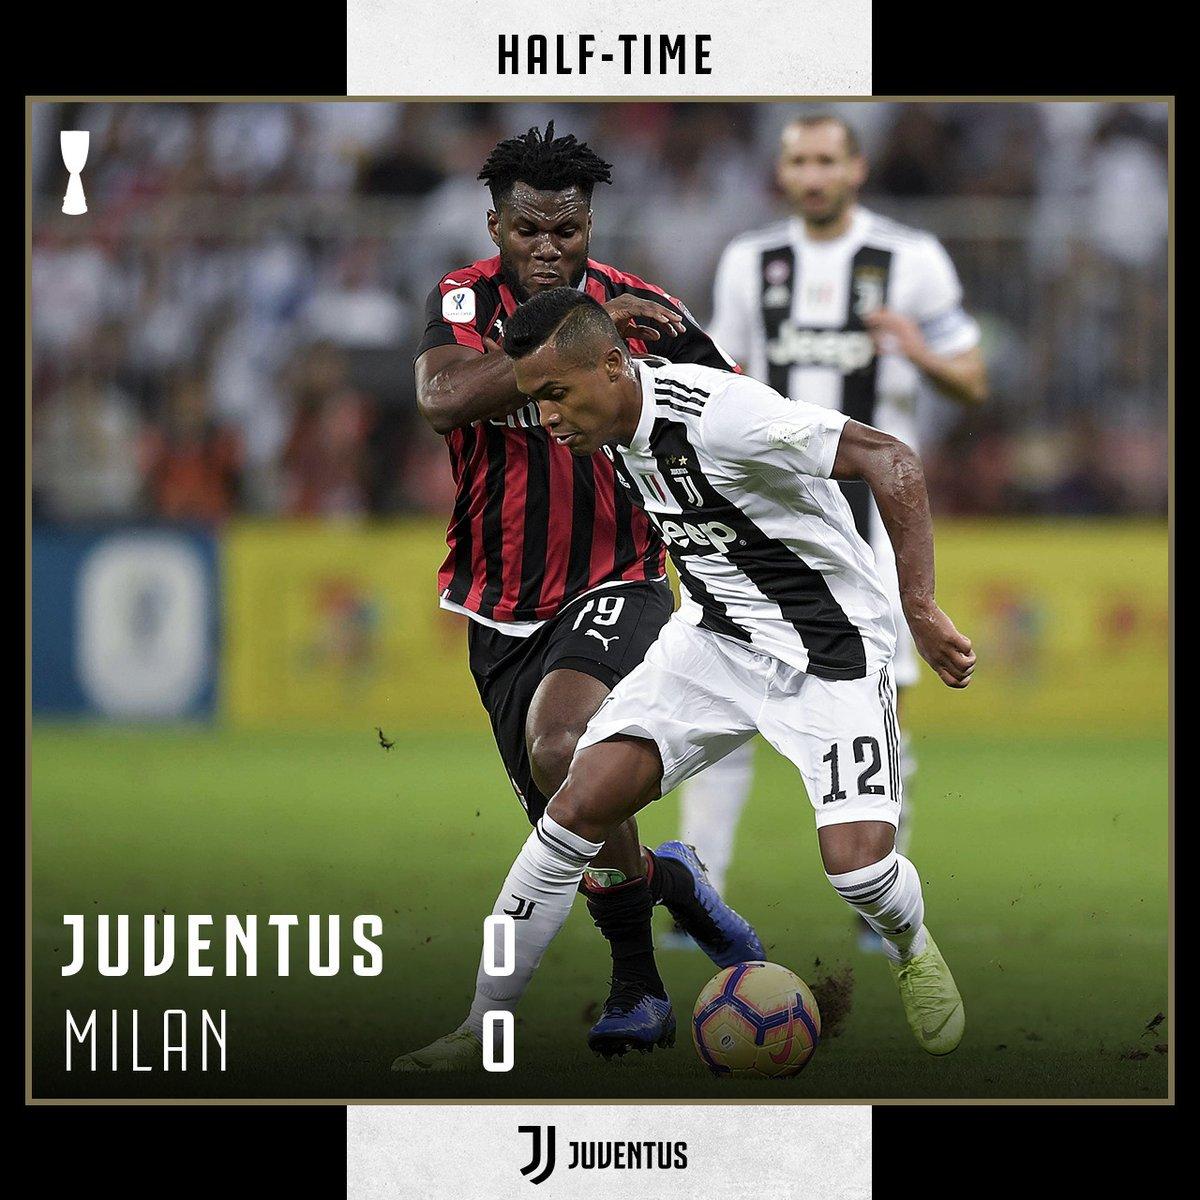 Skor 0-0 menutup babak pertama dalam final Supercoppa Italiana. 📸@juventusfc #ElshintaSport  #SuperCoppa https://t.co/FcEvASBWxs